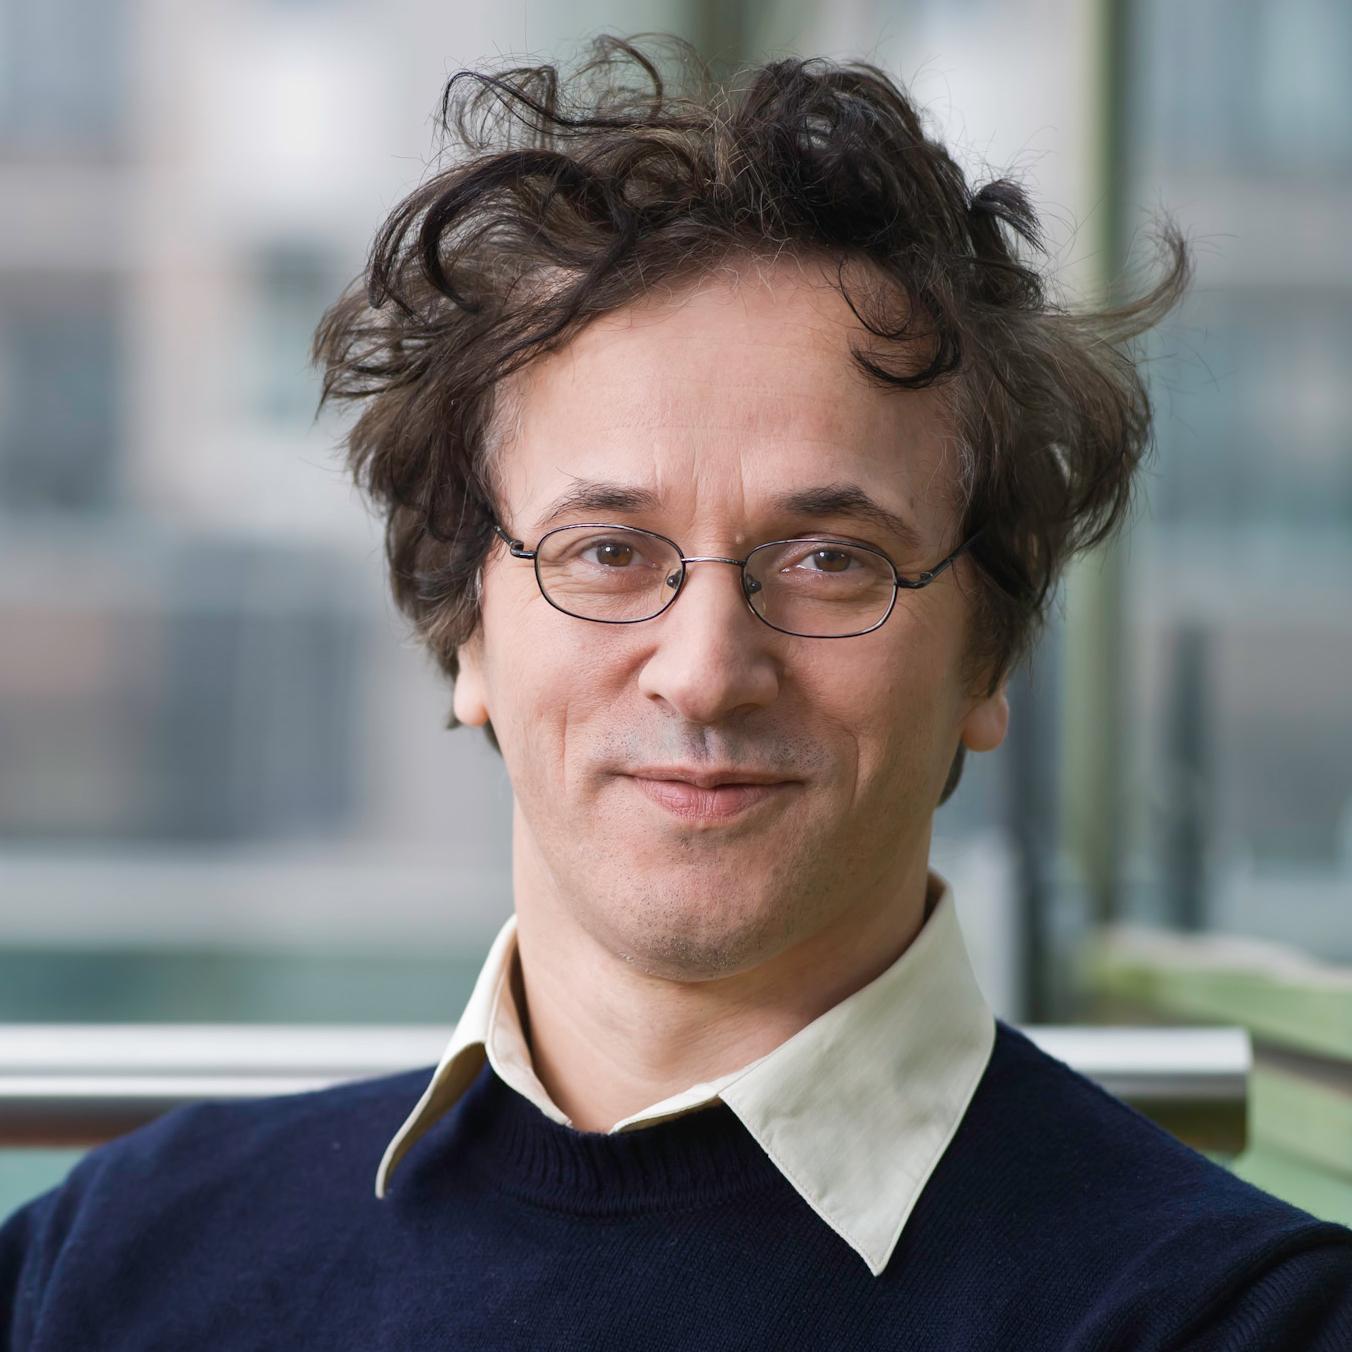 Josef Penninger